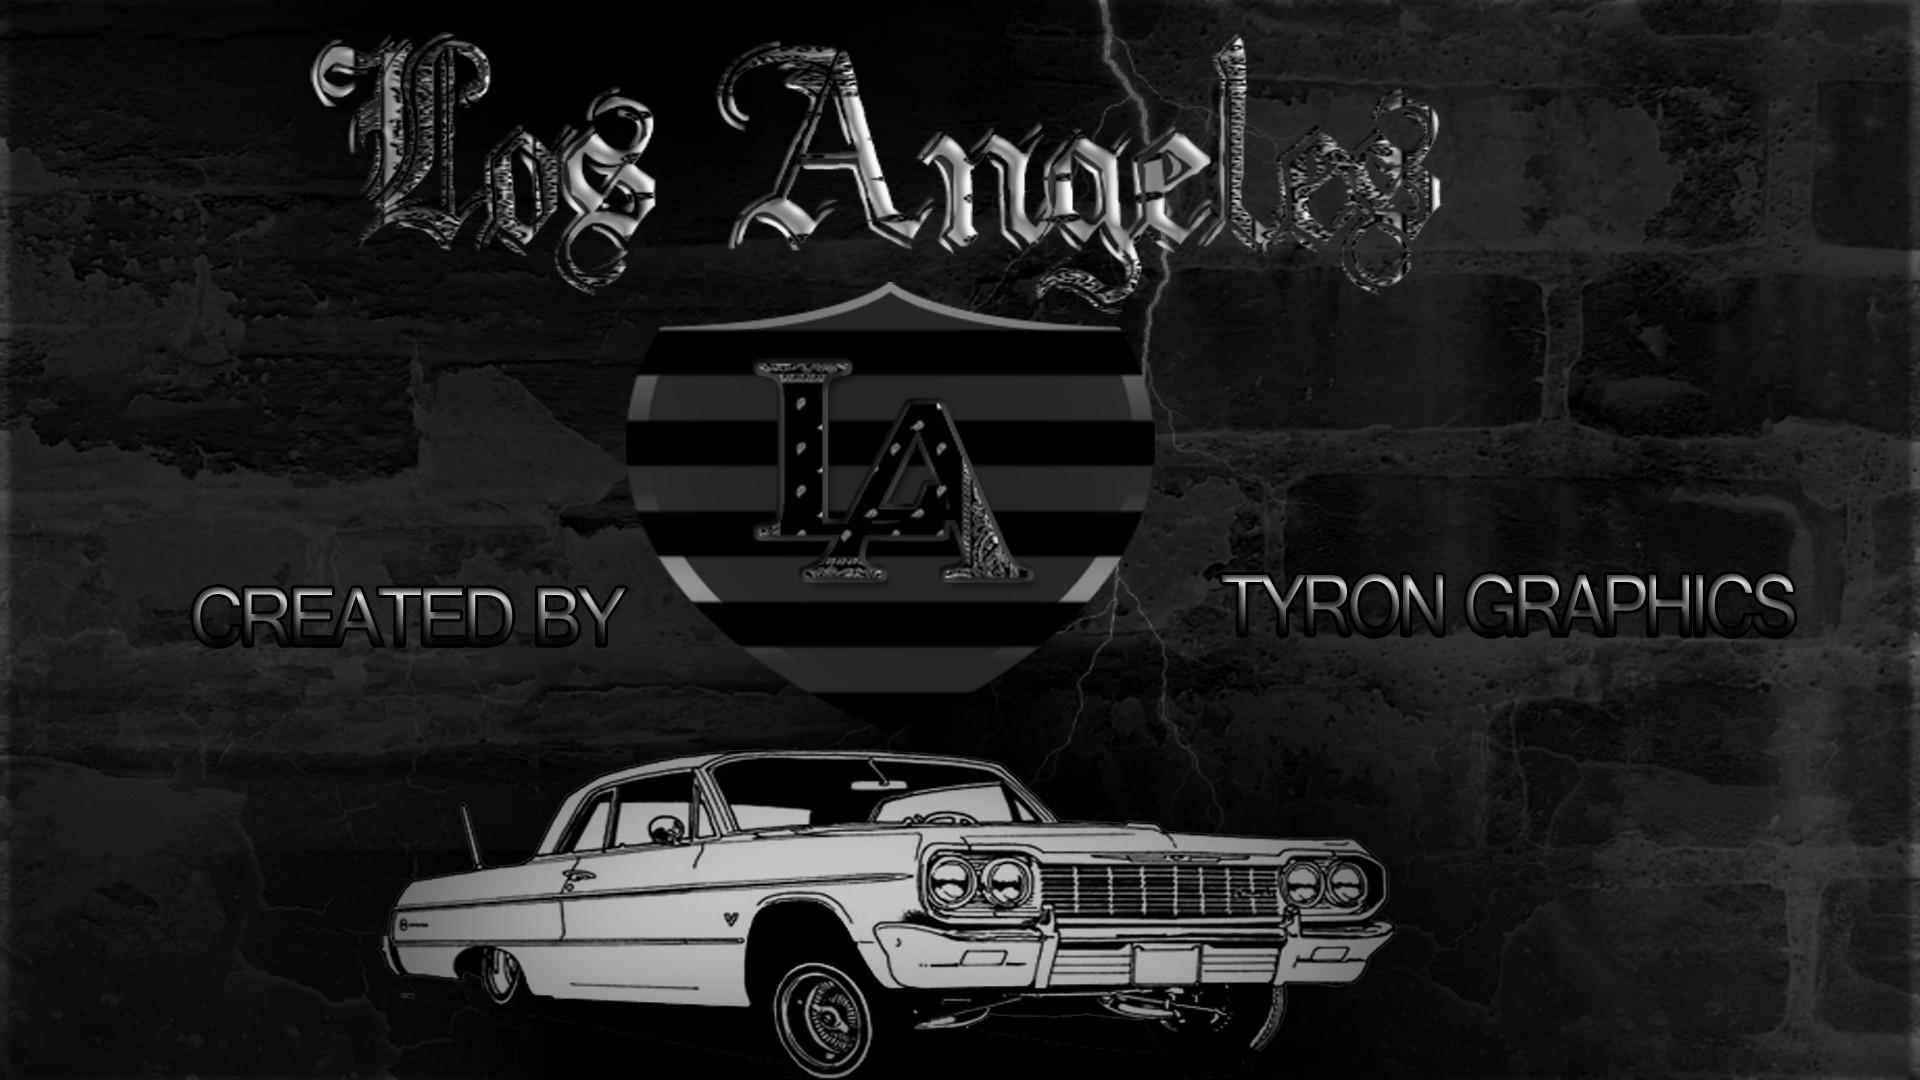 Res: 1920x1080, Los angeles chevy impala lowrider wallpaper